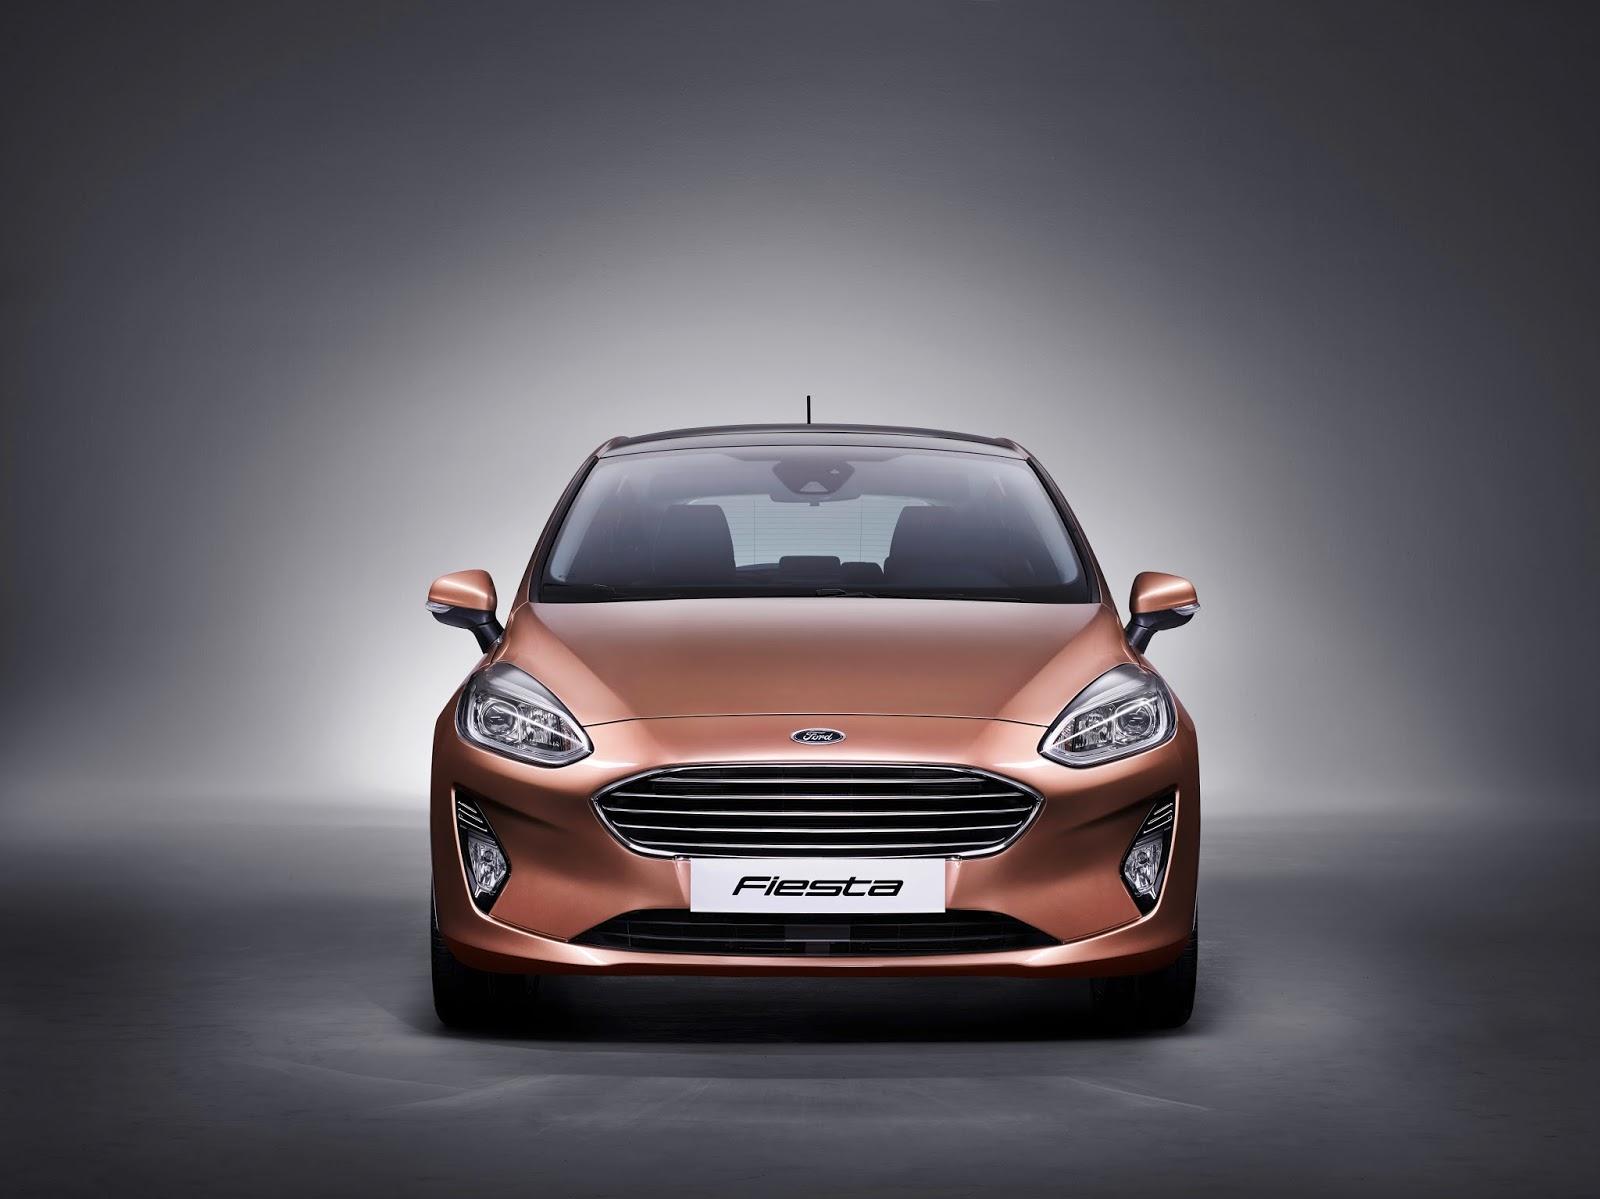 FORD FIESTA2016 TITANIUM FRONT 04 Τα πρώτα Ford Fiesta έρχονται στην Ελλάδα, με τιμή από 12.990€ Bestseller, Ford, Ford Fiesta, supermini, Λανσάρισμα